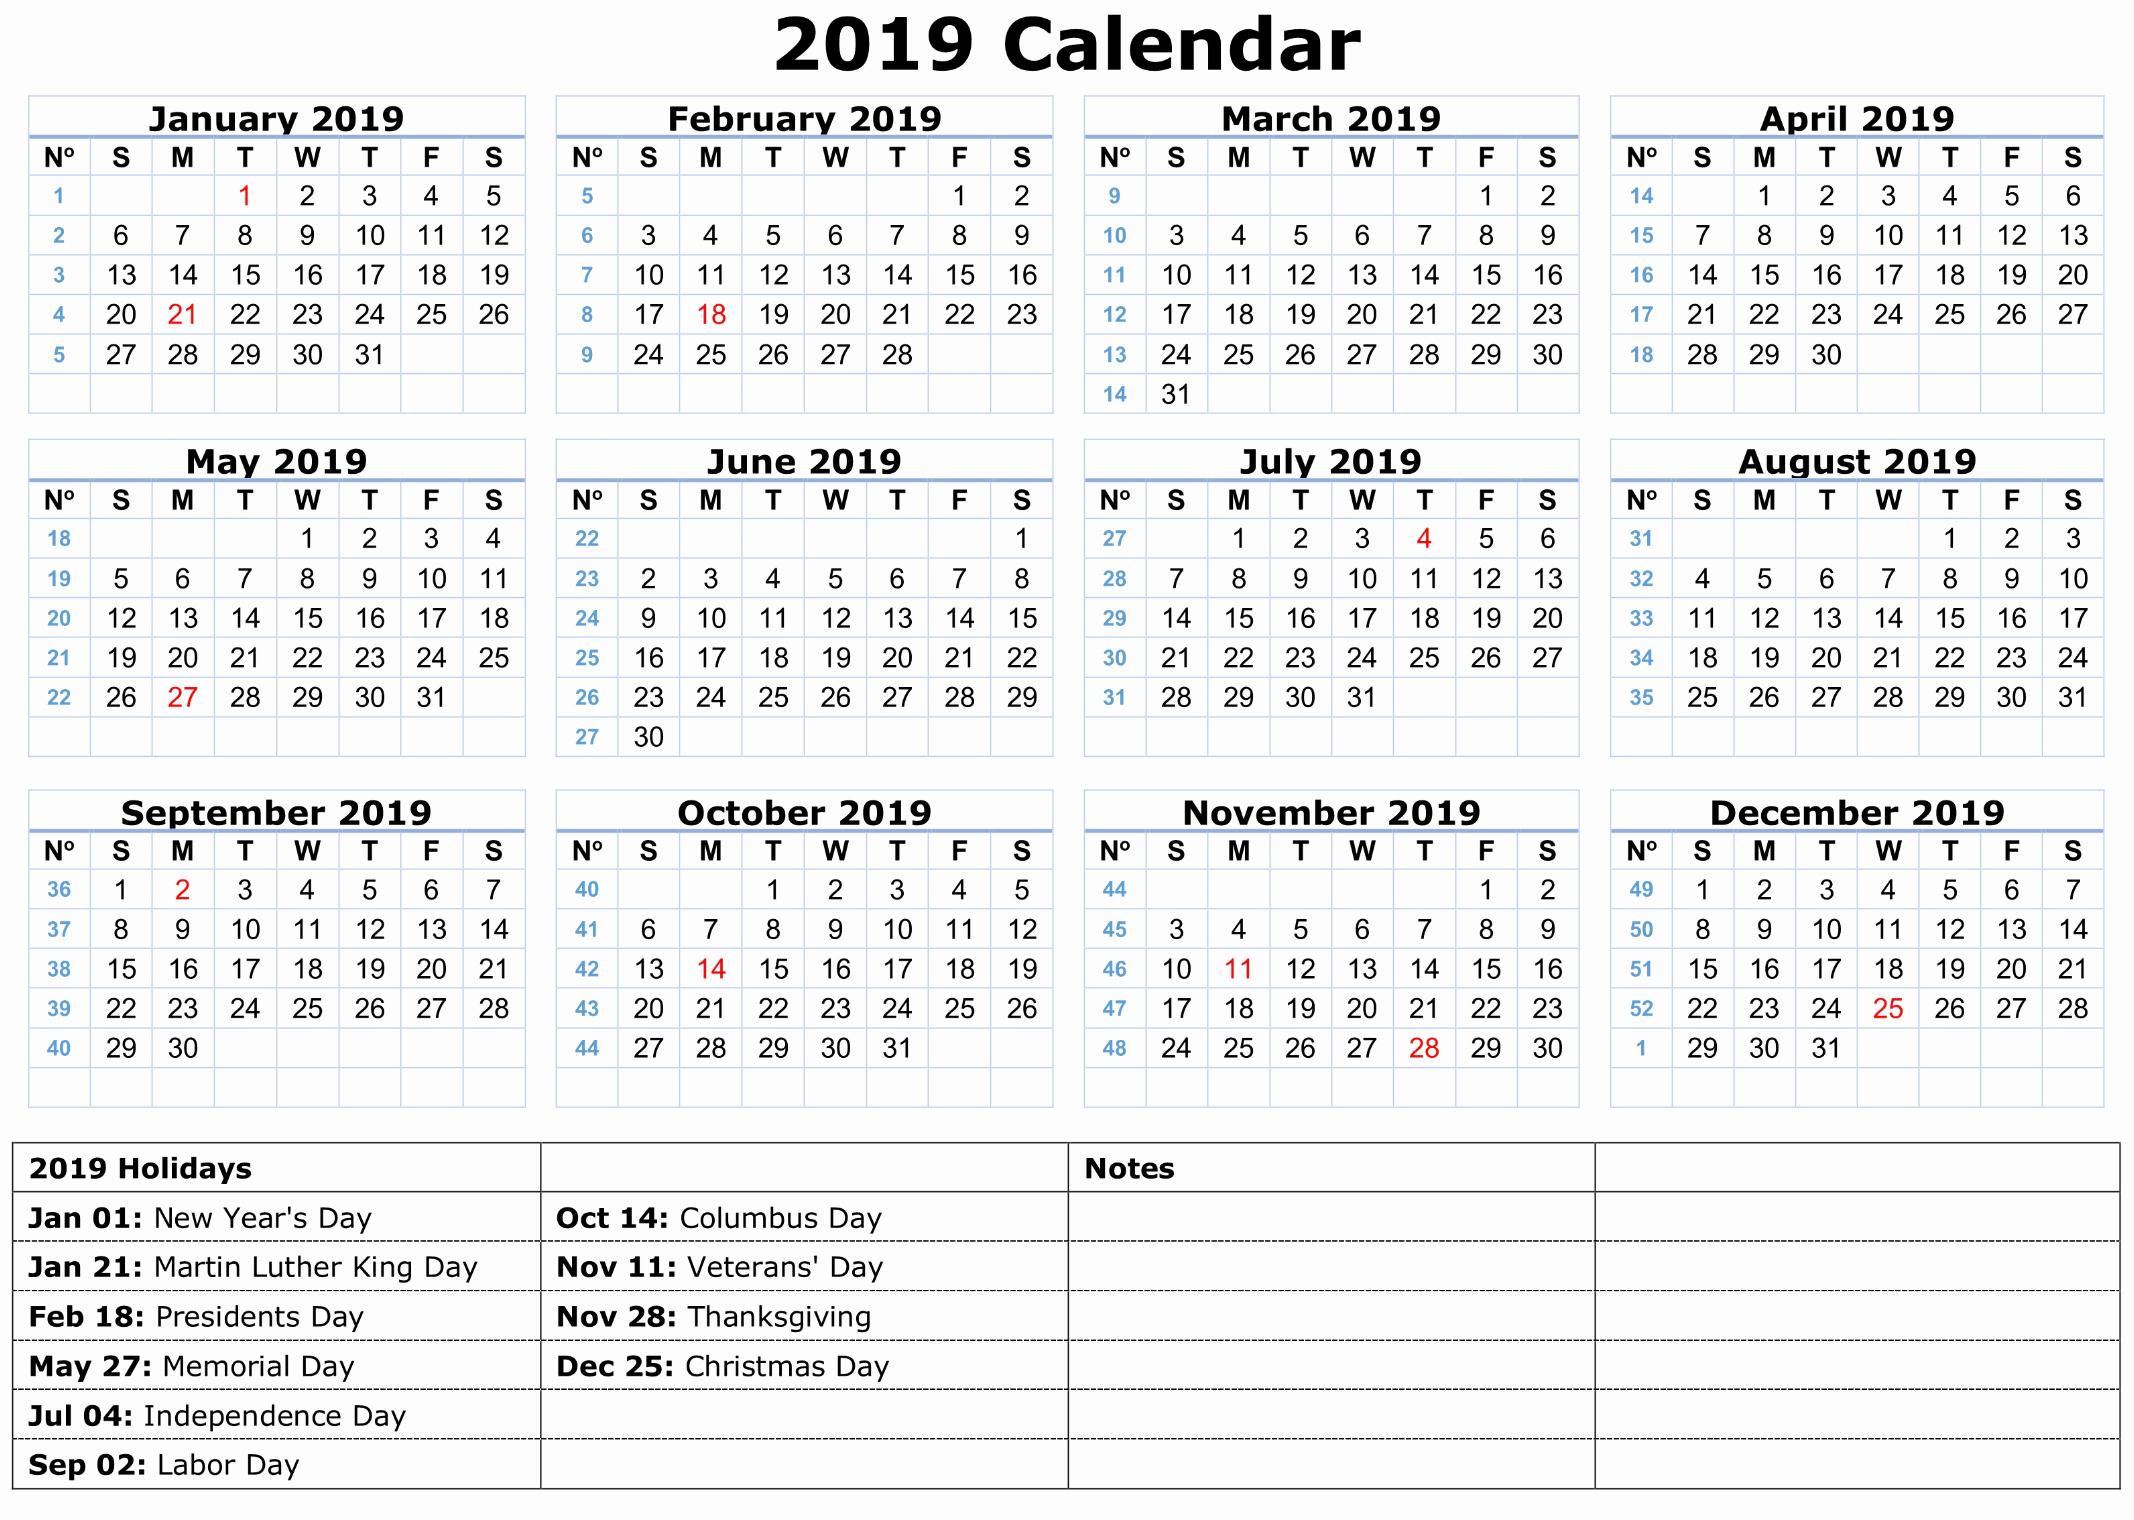 Free 2019 Calendar Template Lovely 2019 Calendar Amazonaws